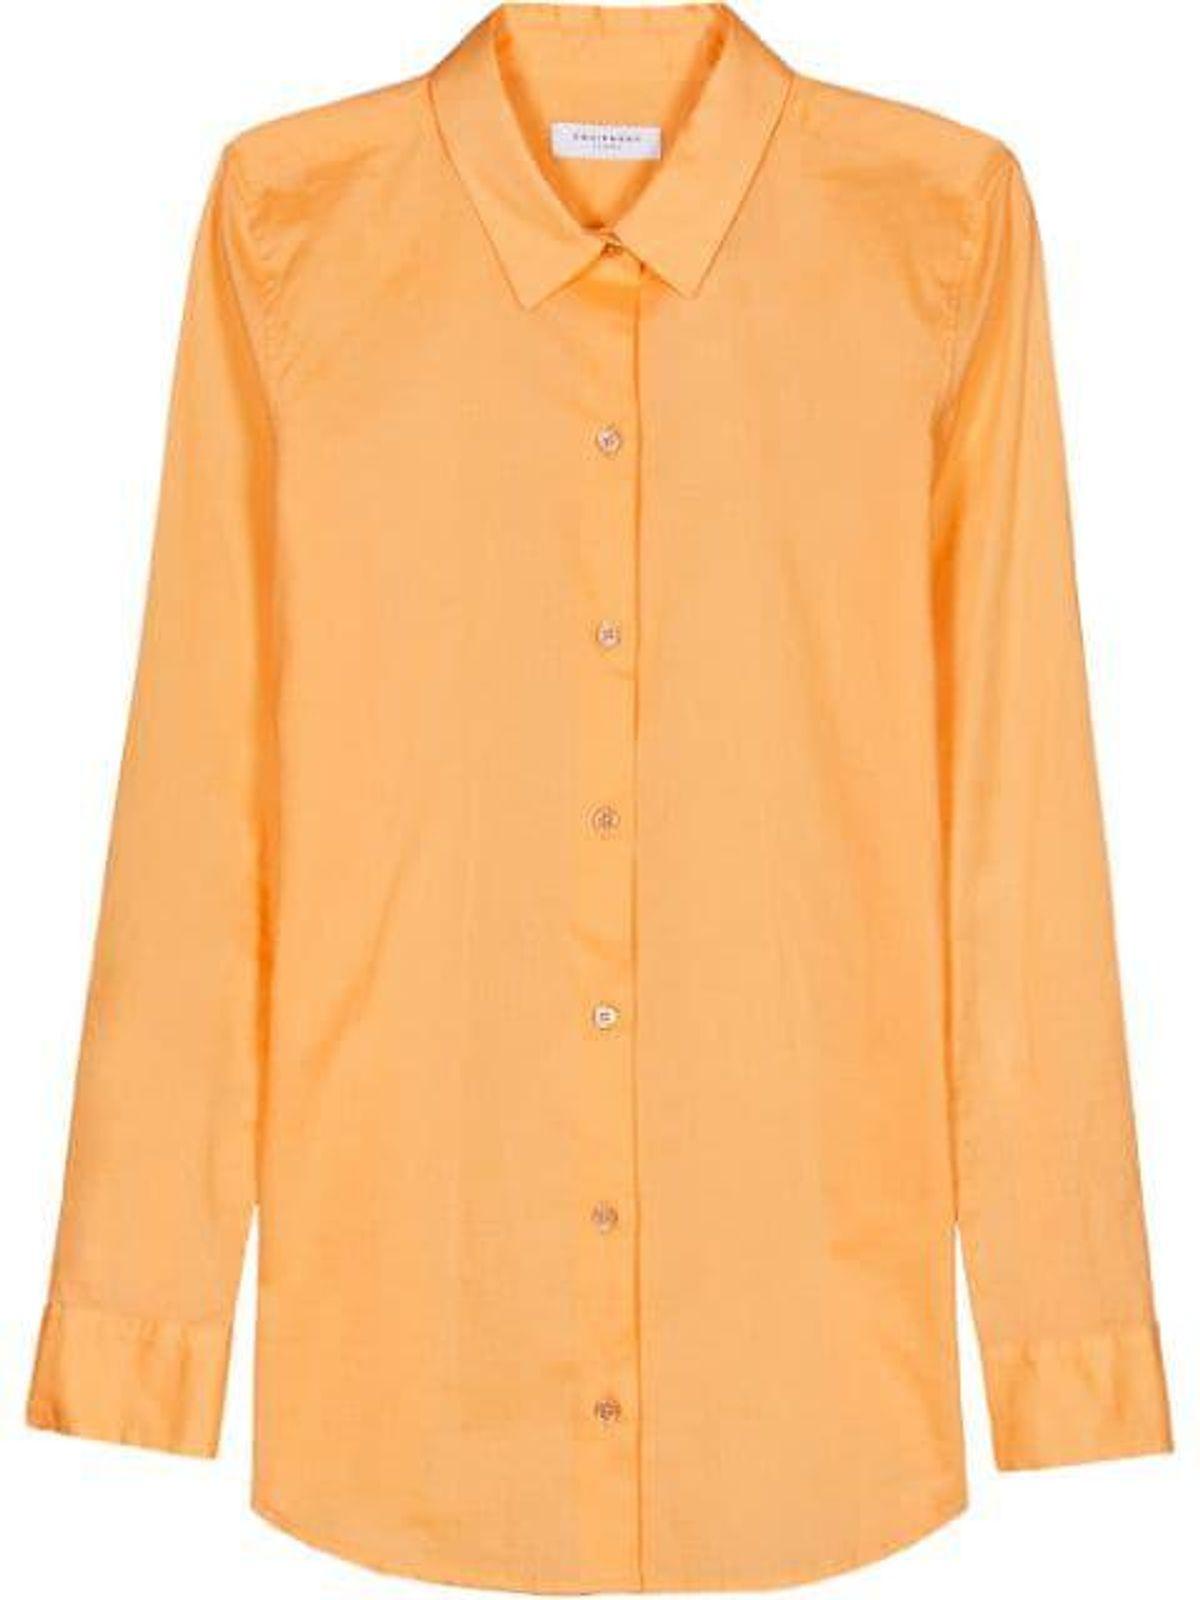 Essential Cotton Shirt